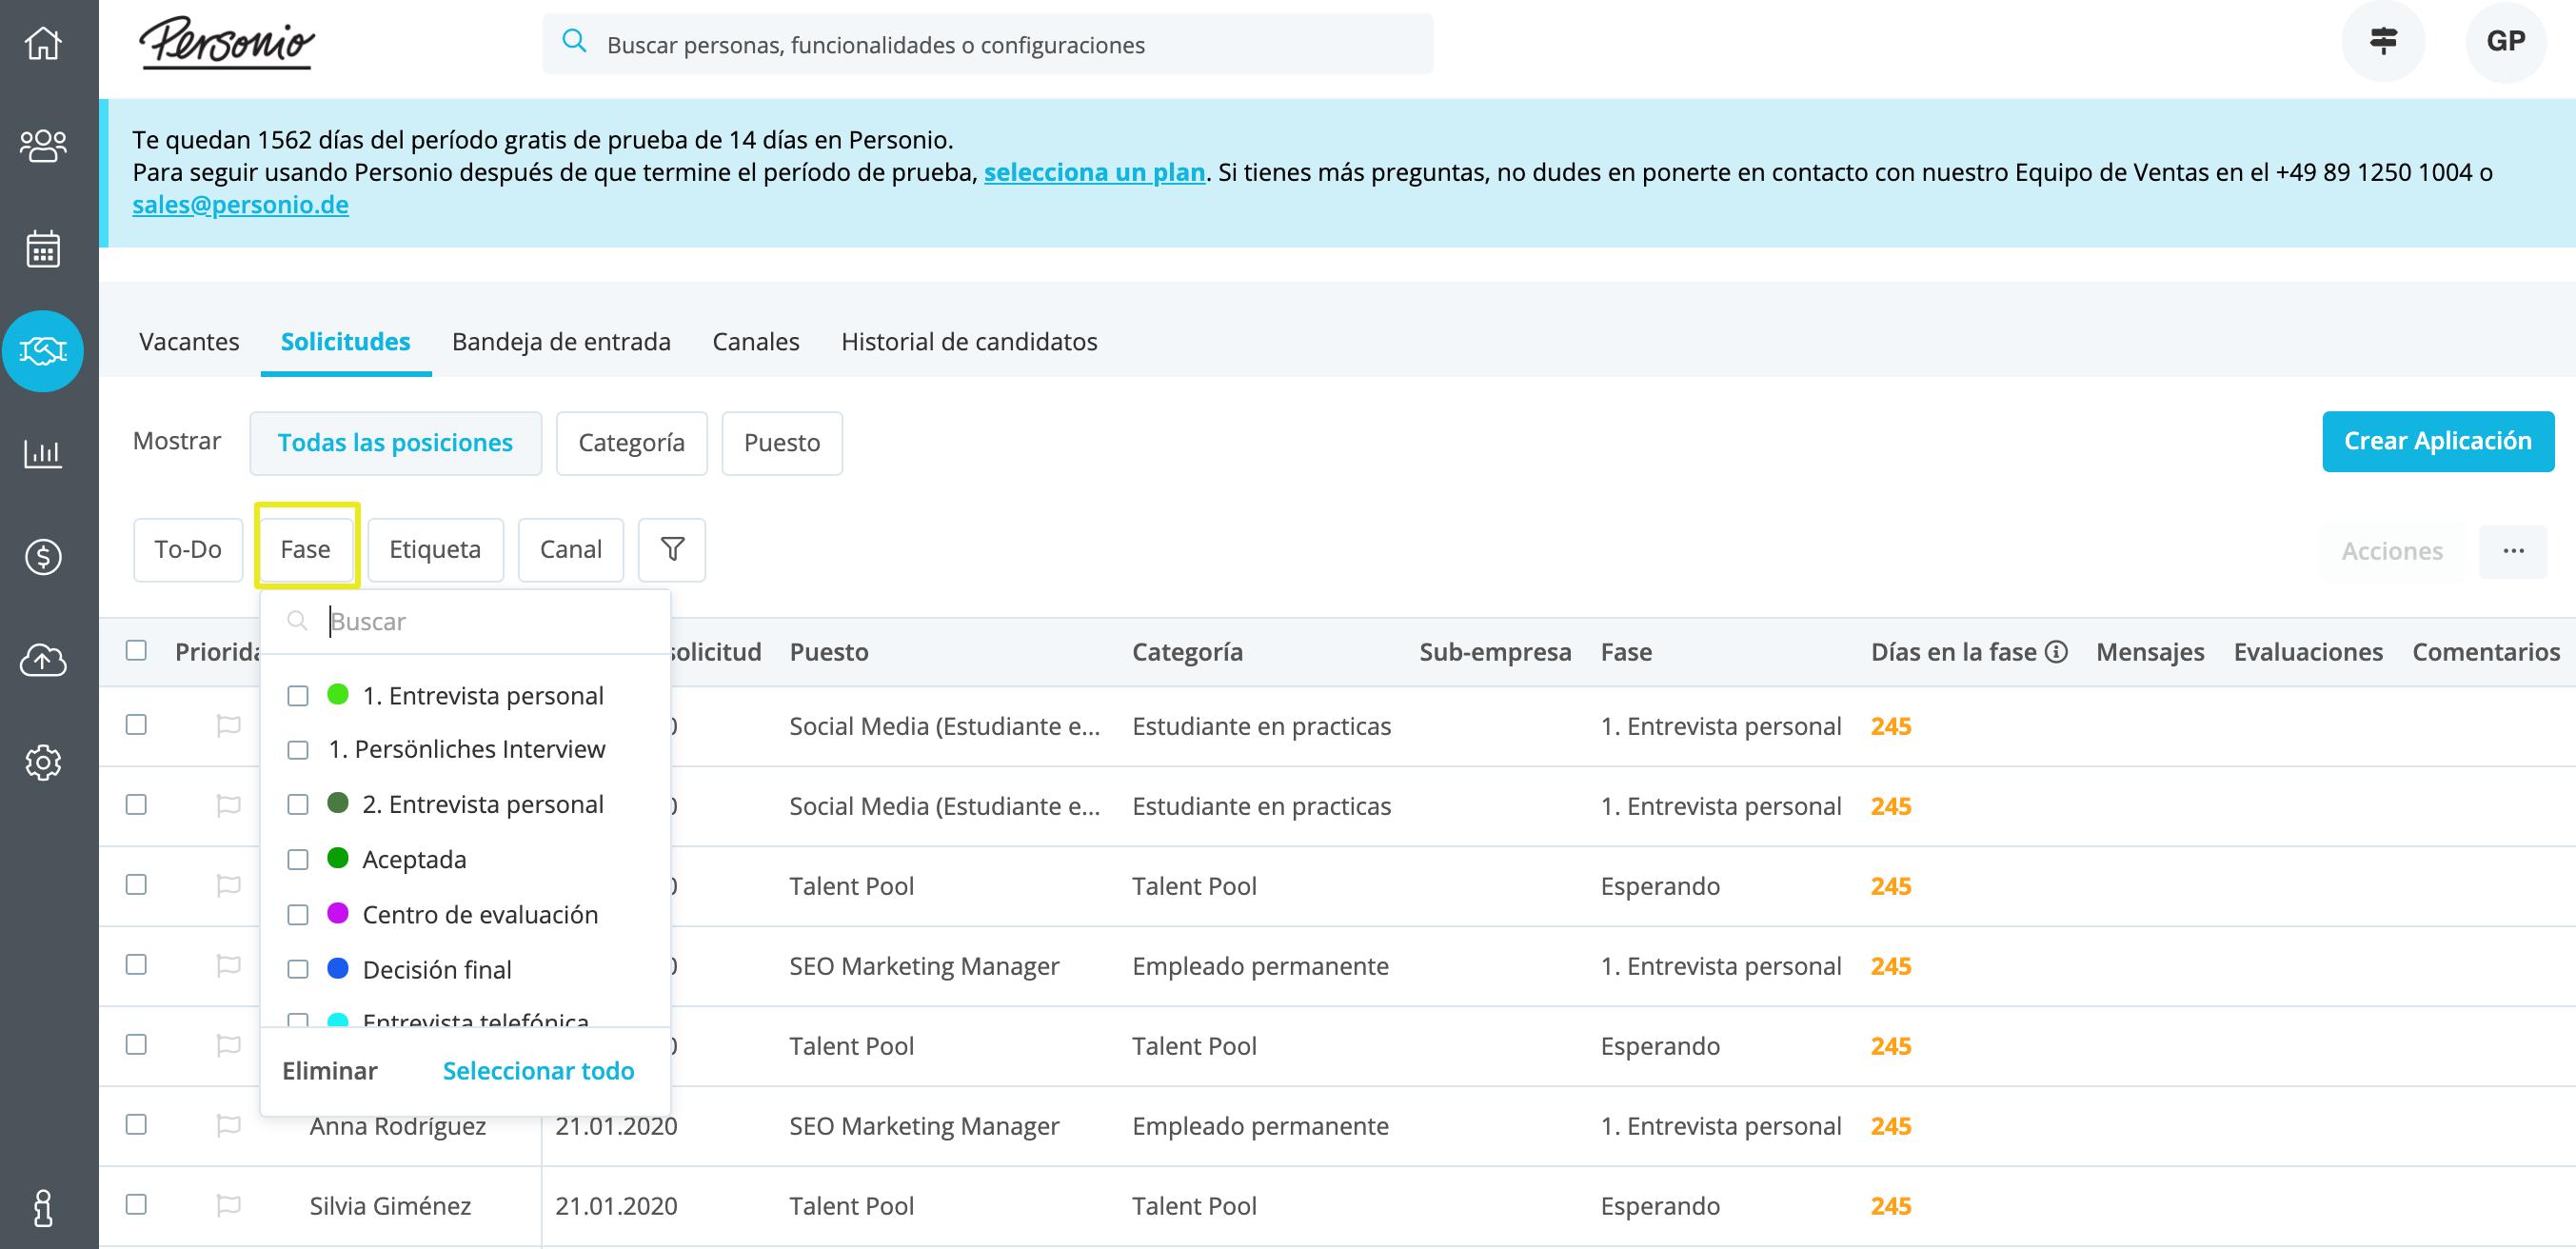 application-list-filter-phase_es.png